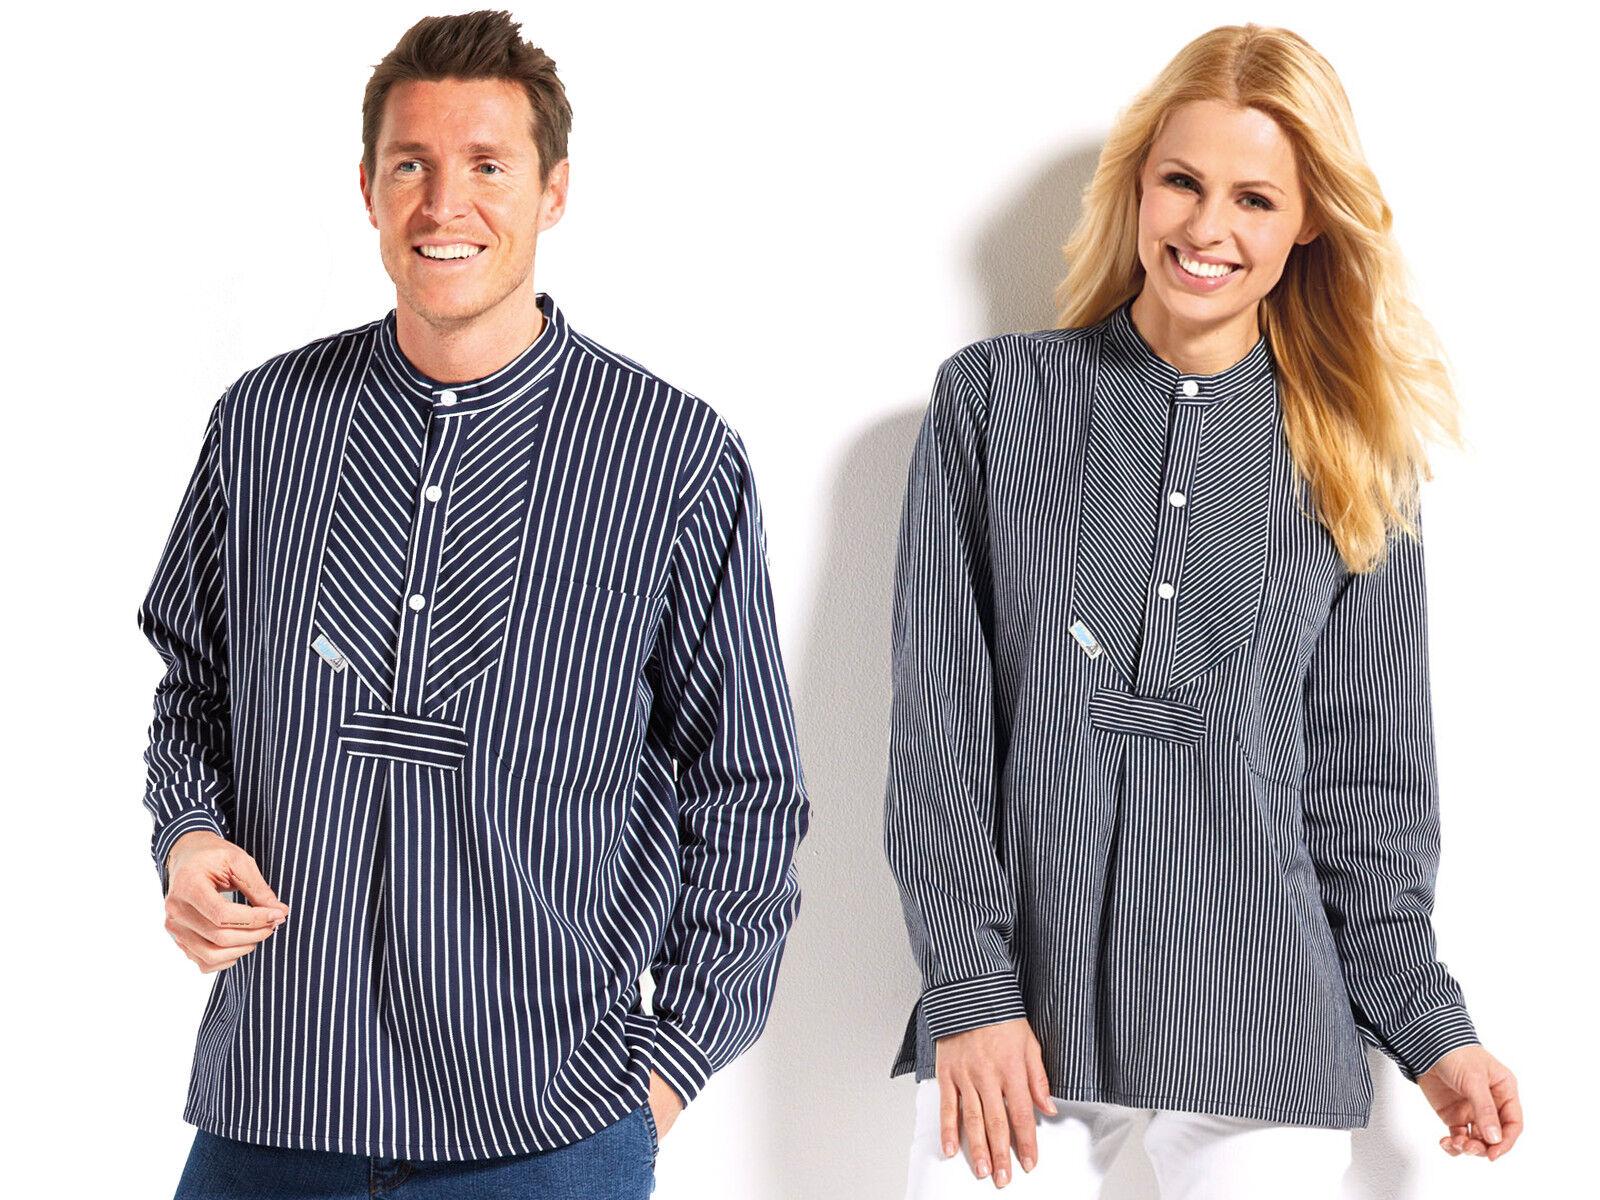 Fishing Shirt Narrow or Wide Striped from Modas S-3XL Finkenwerder Style Shirt